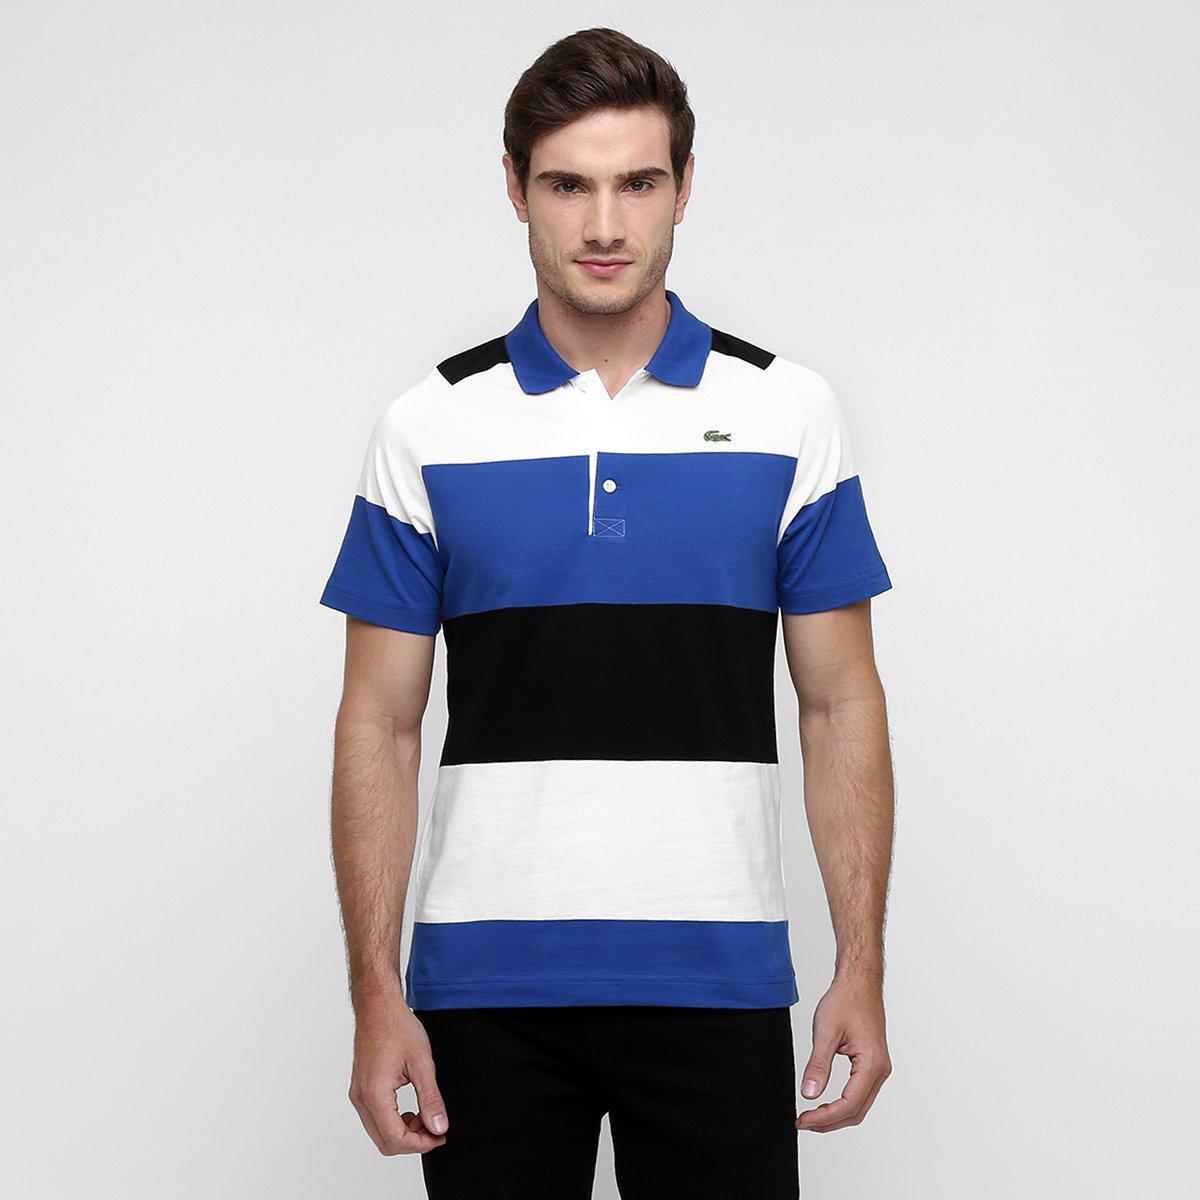 4946a0e8291f3 Camisa Polo Lacoste Listrada - Compre Agora